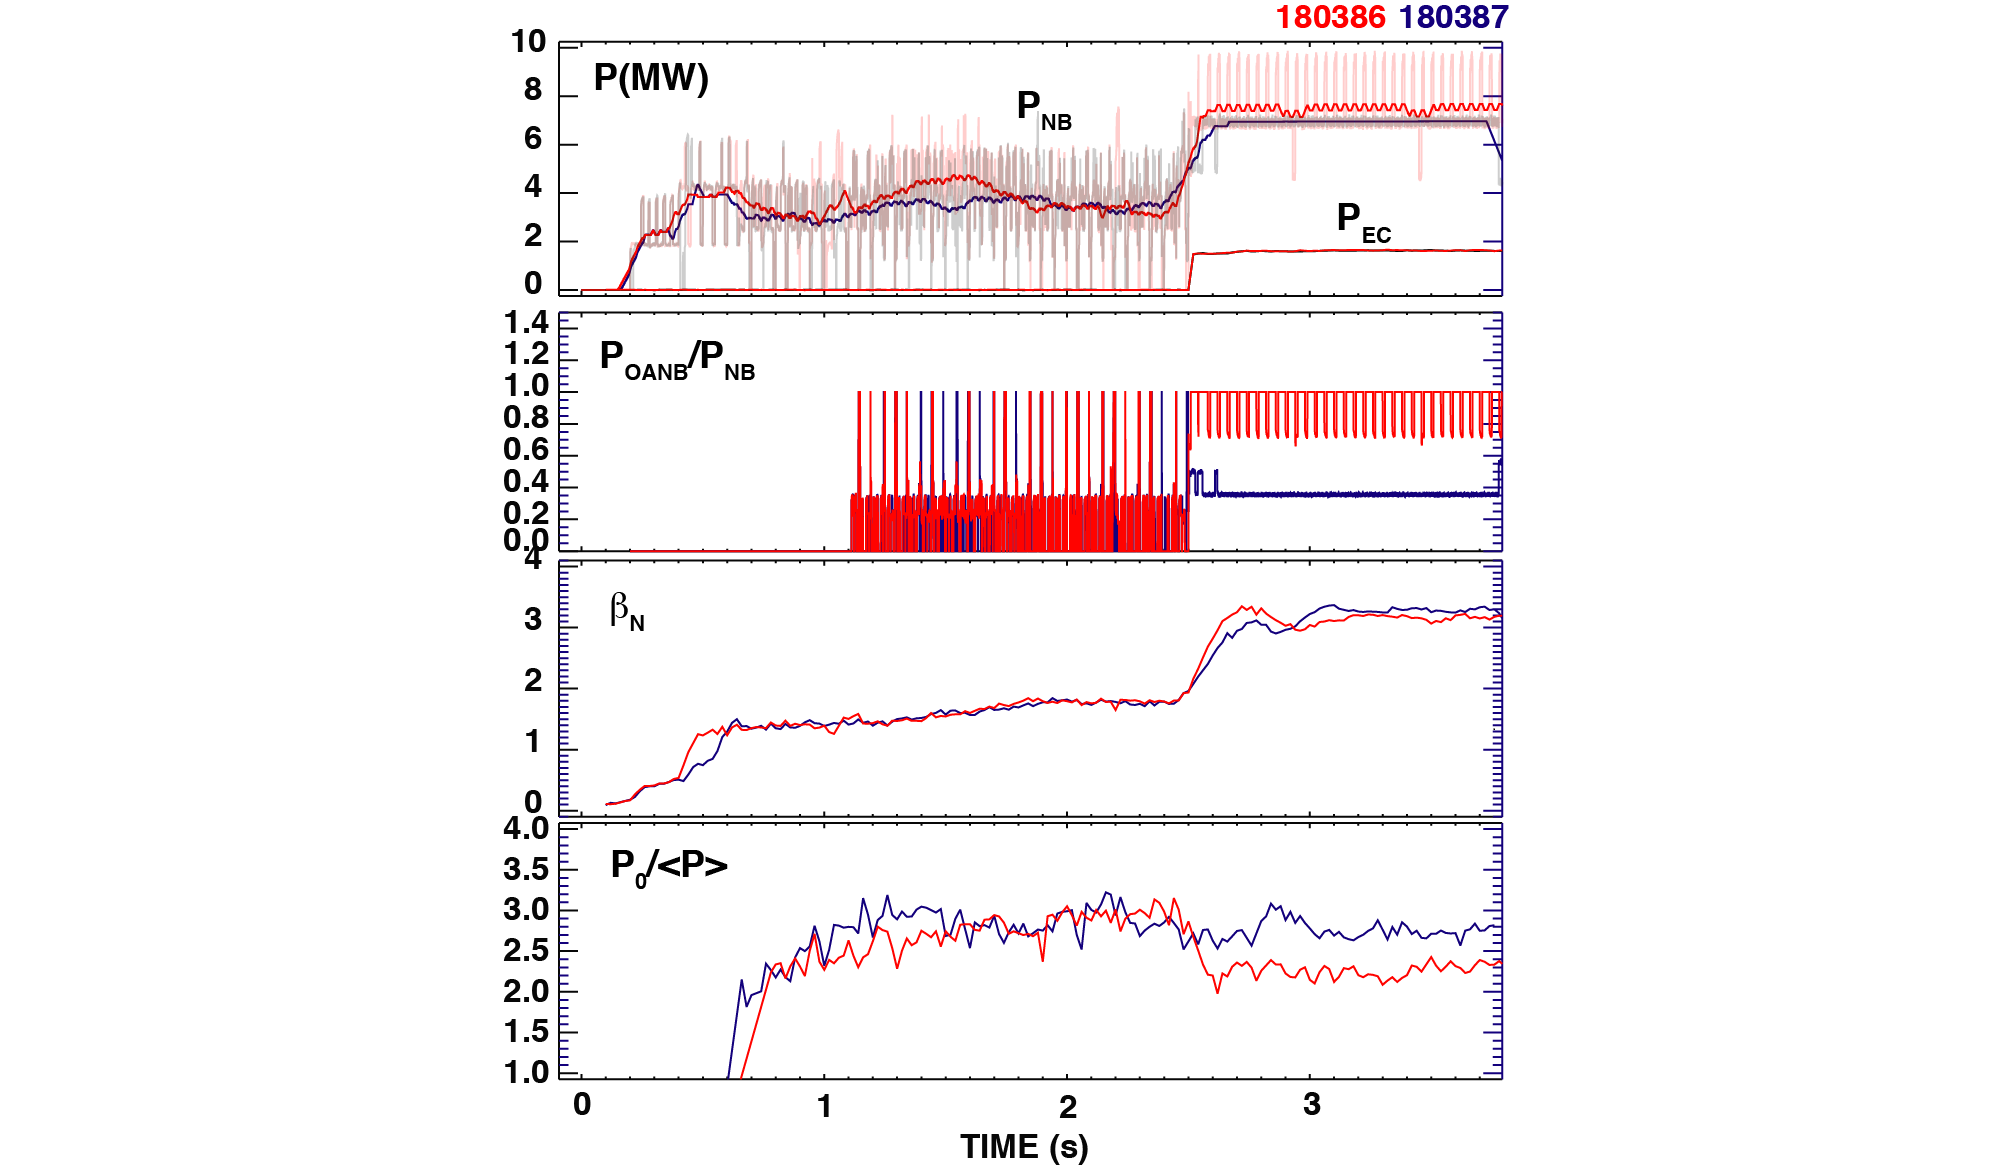 Pressure broadening with dominant off-axis NB heating at $\beta_N>3$